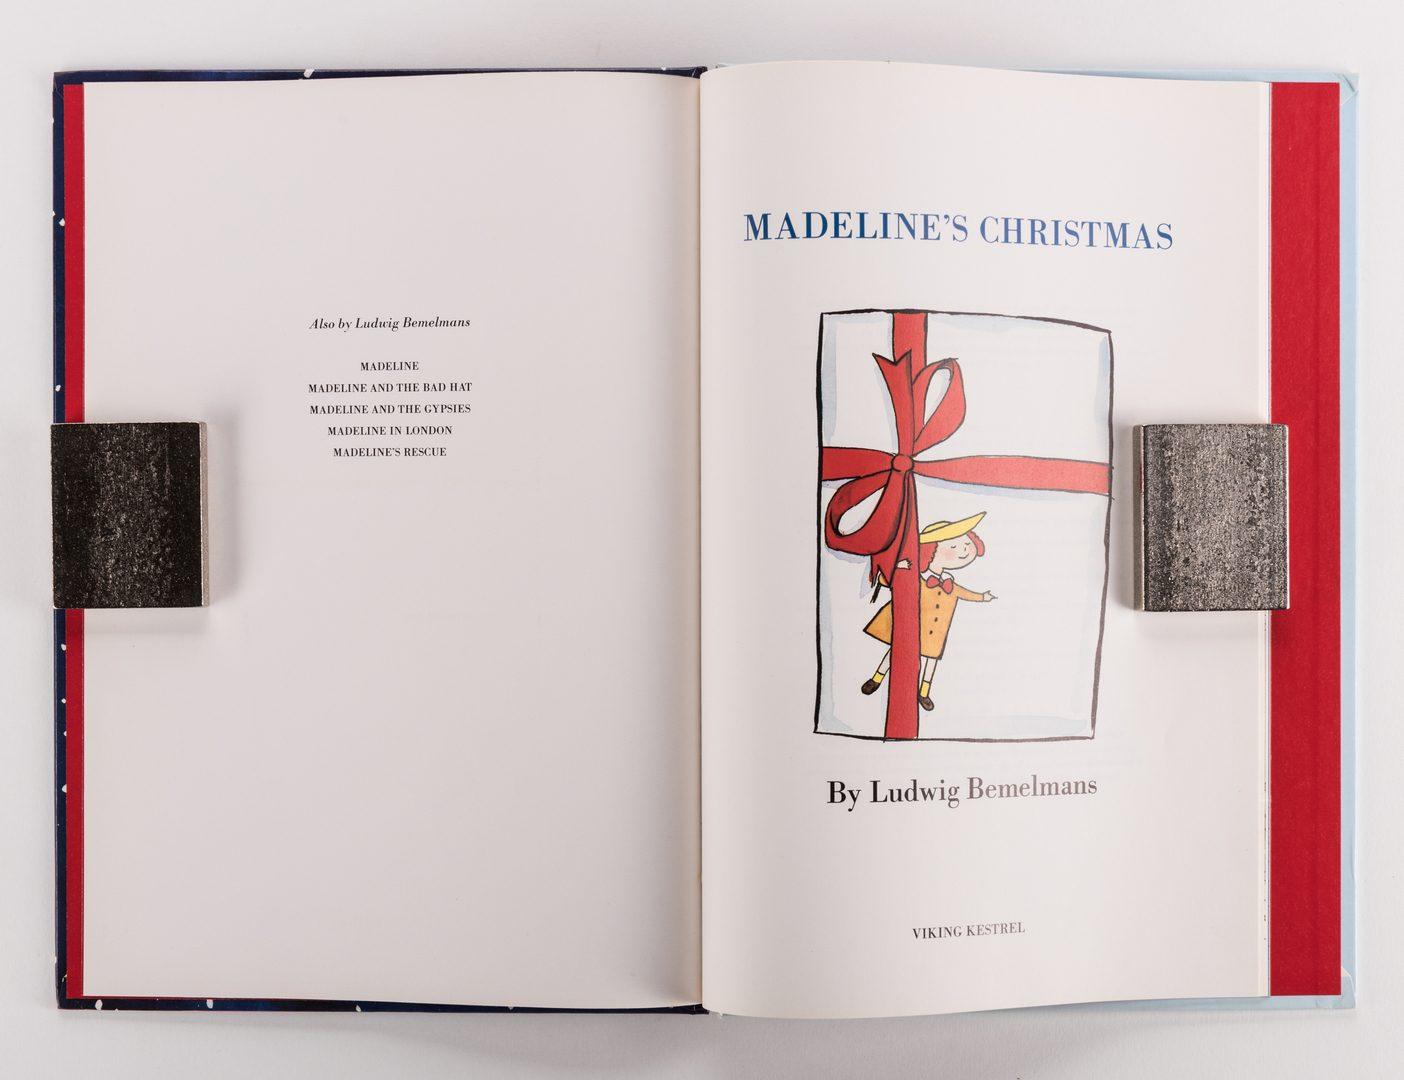 Lot 465: Bemelmans Madeline's X-Mas, 1st Ed. & Hardcover, 2 items